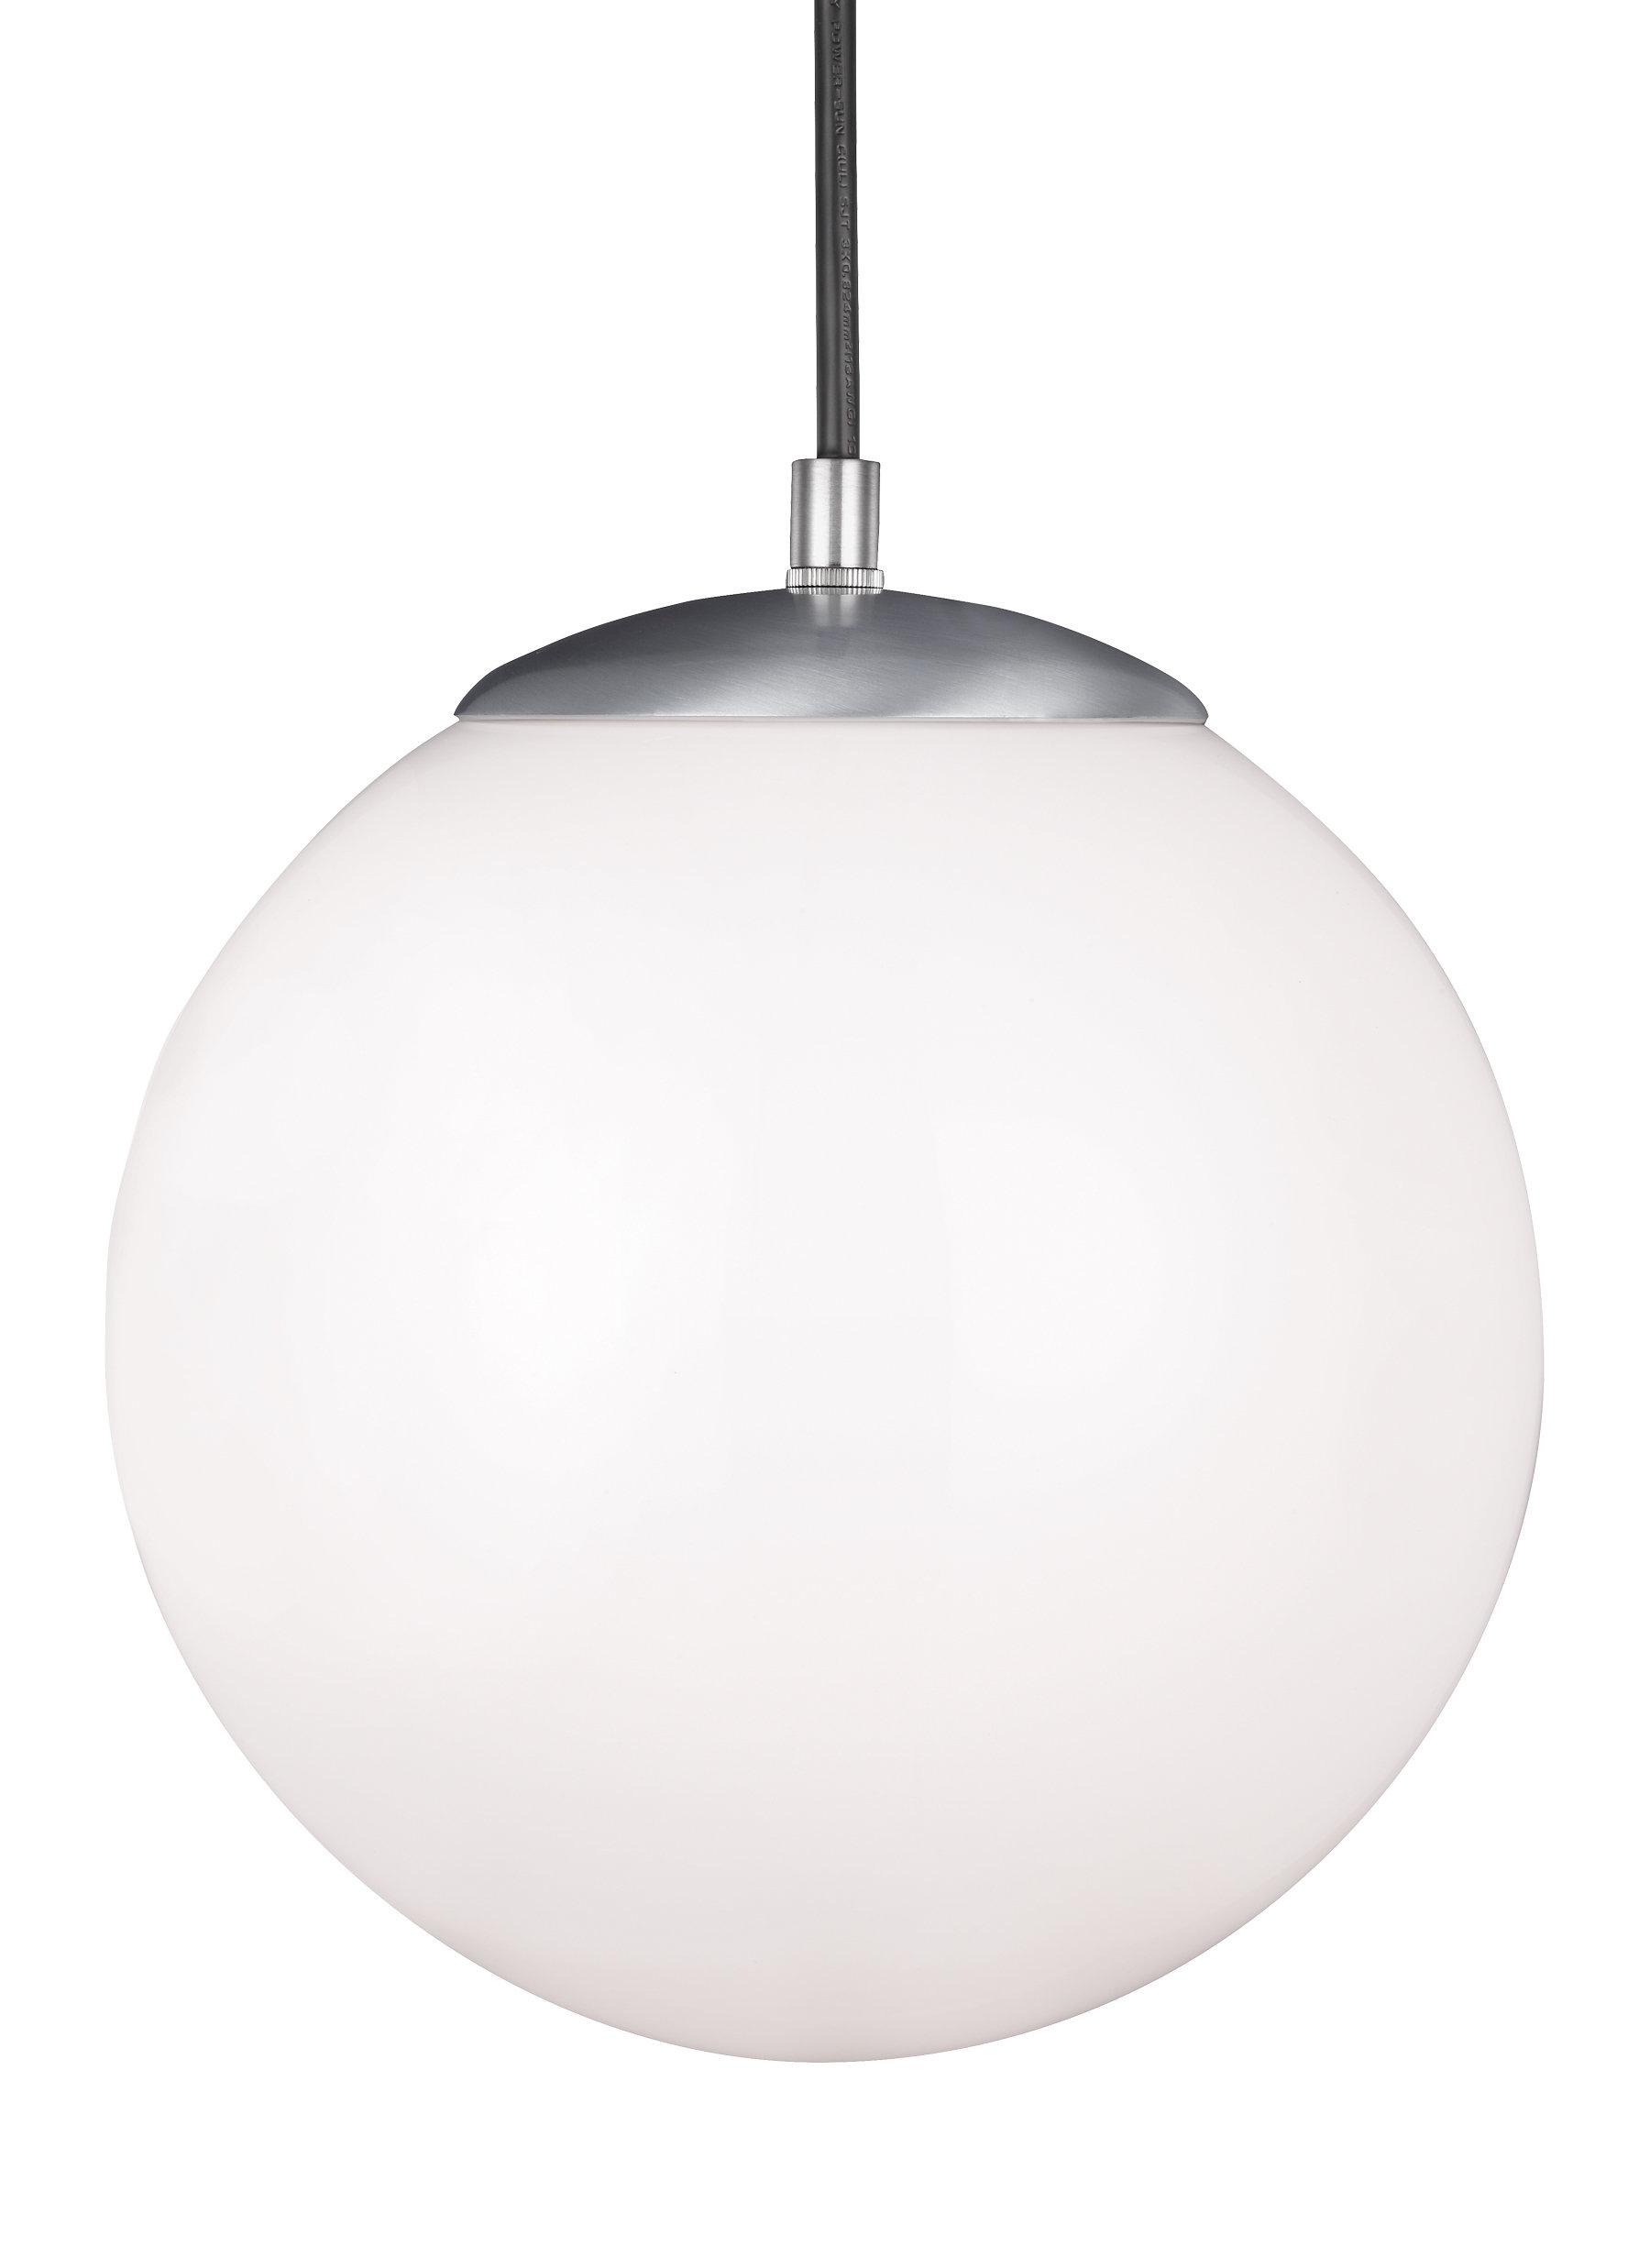 Quinn 1-Light Led Globe Pendant pertaining to Bautista 1-Light Single Globe Pendants (Image 27 of 30)